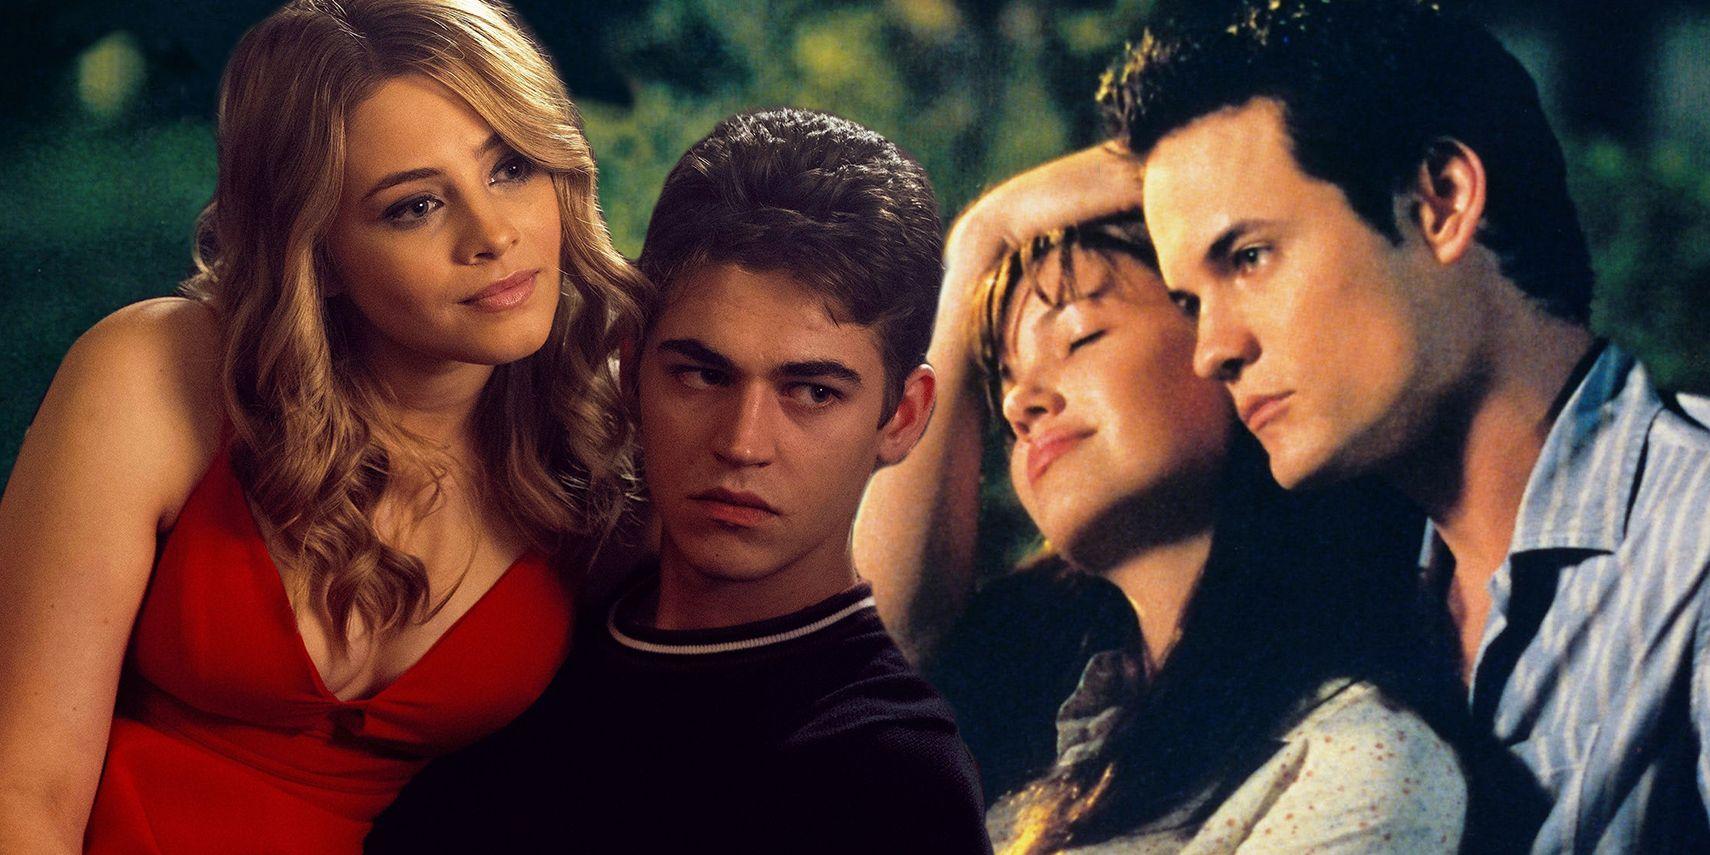 With tension movies romantic romantic movies